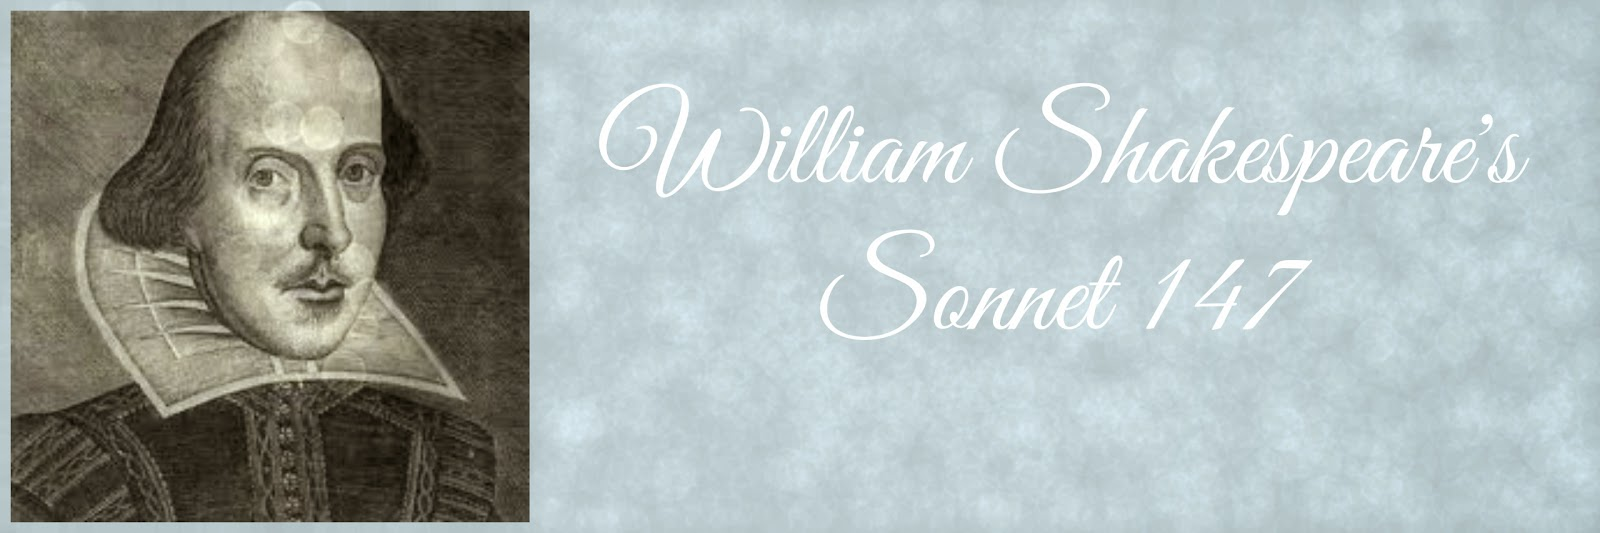 William Shakespeare S Sonnet 147 My Love I A Fever Longing Still Analysis